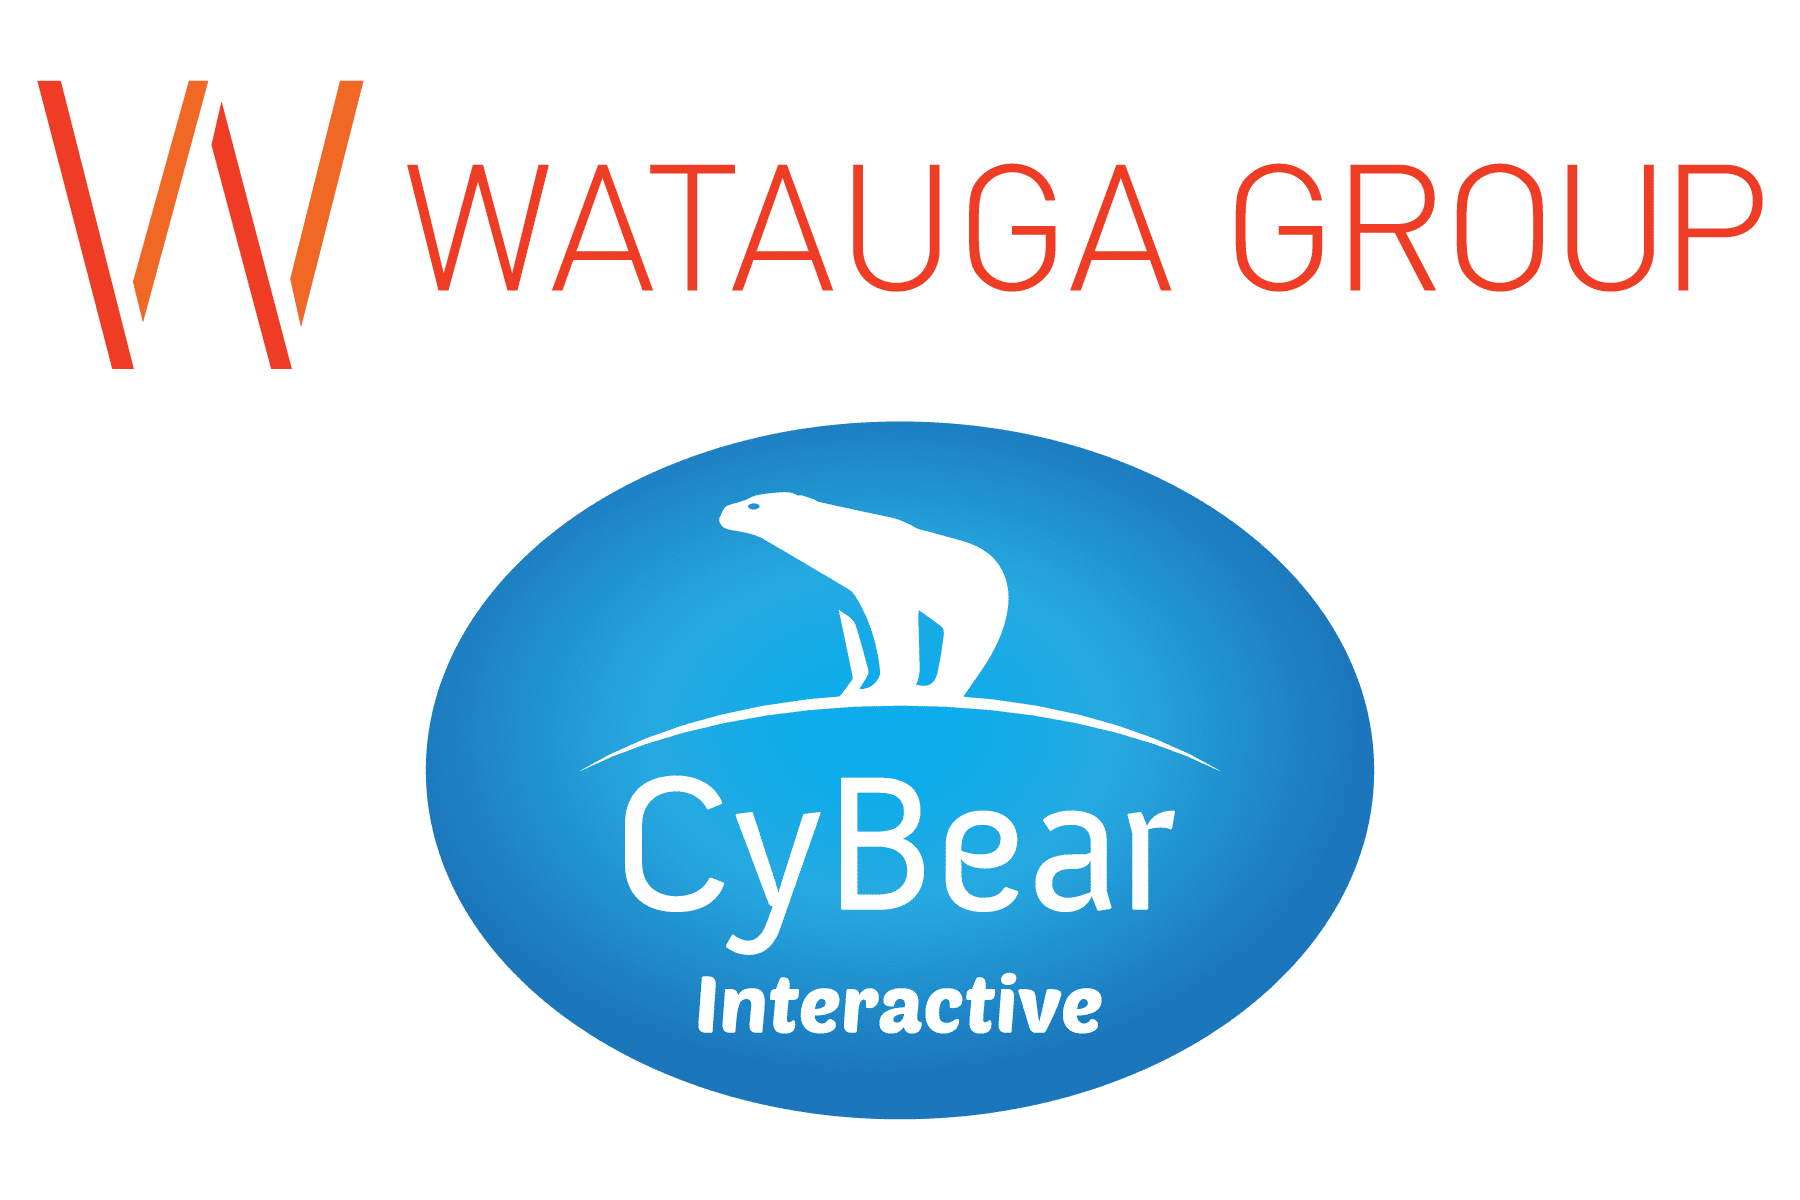 https://atlantaadclub.org/wp-content/uploads/2018/09/WataugaCyBear-logo_combo_horizontal.png